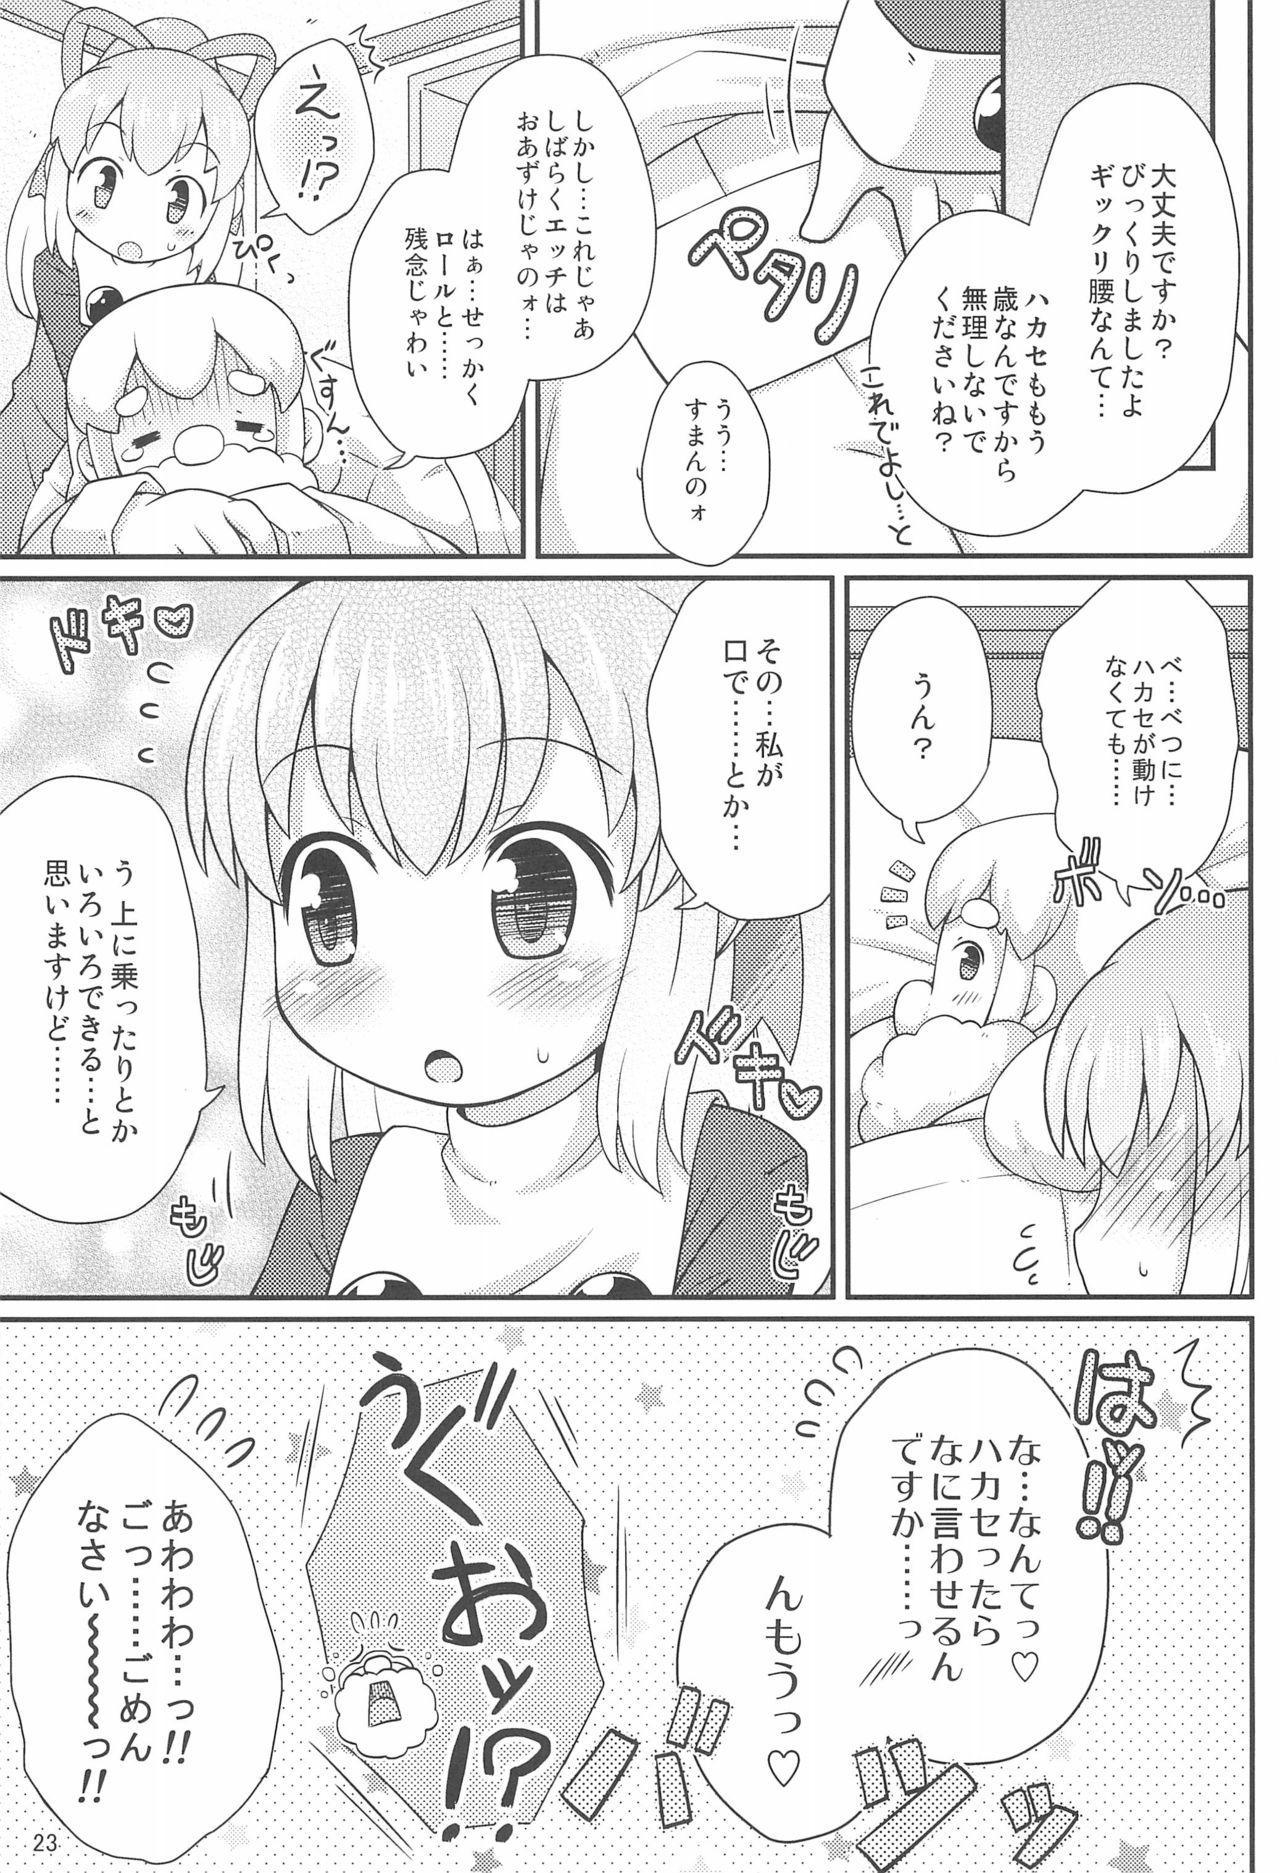 Roll-chan Onegaishimasu 22